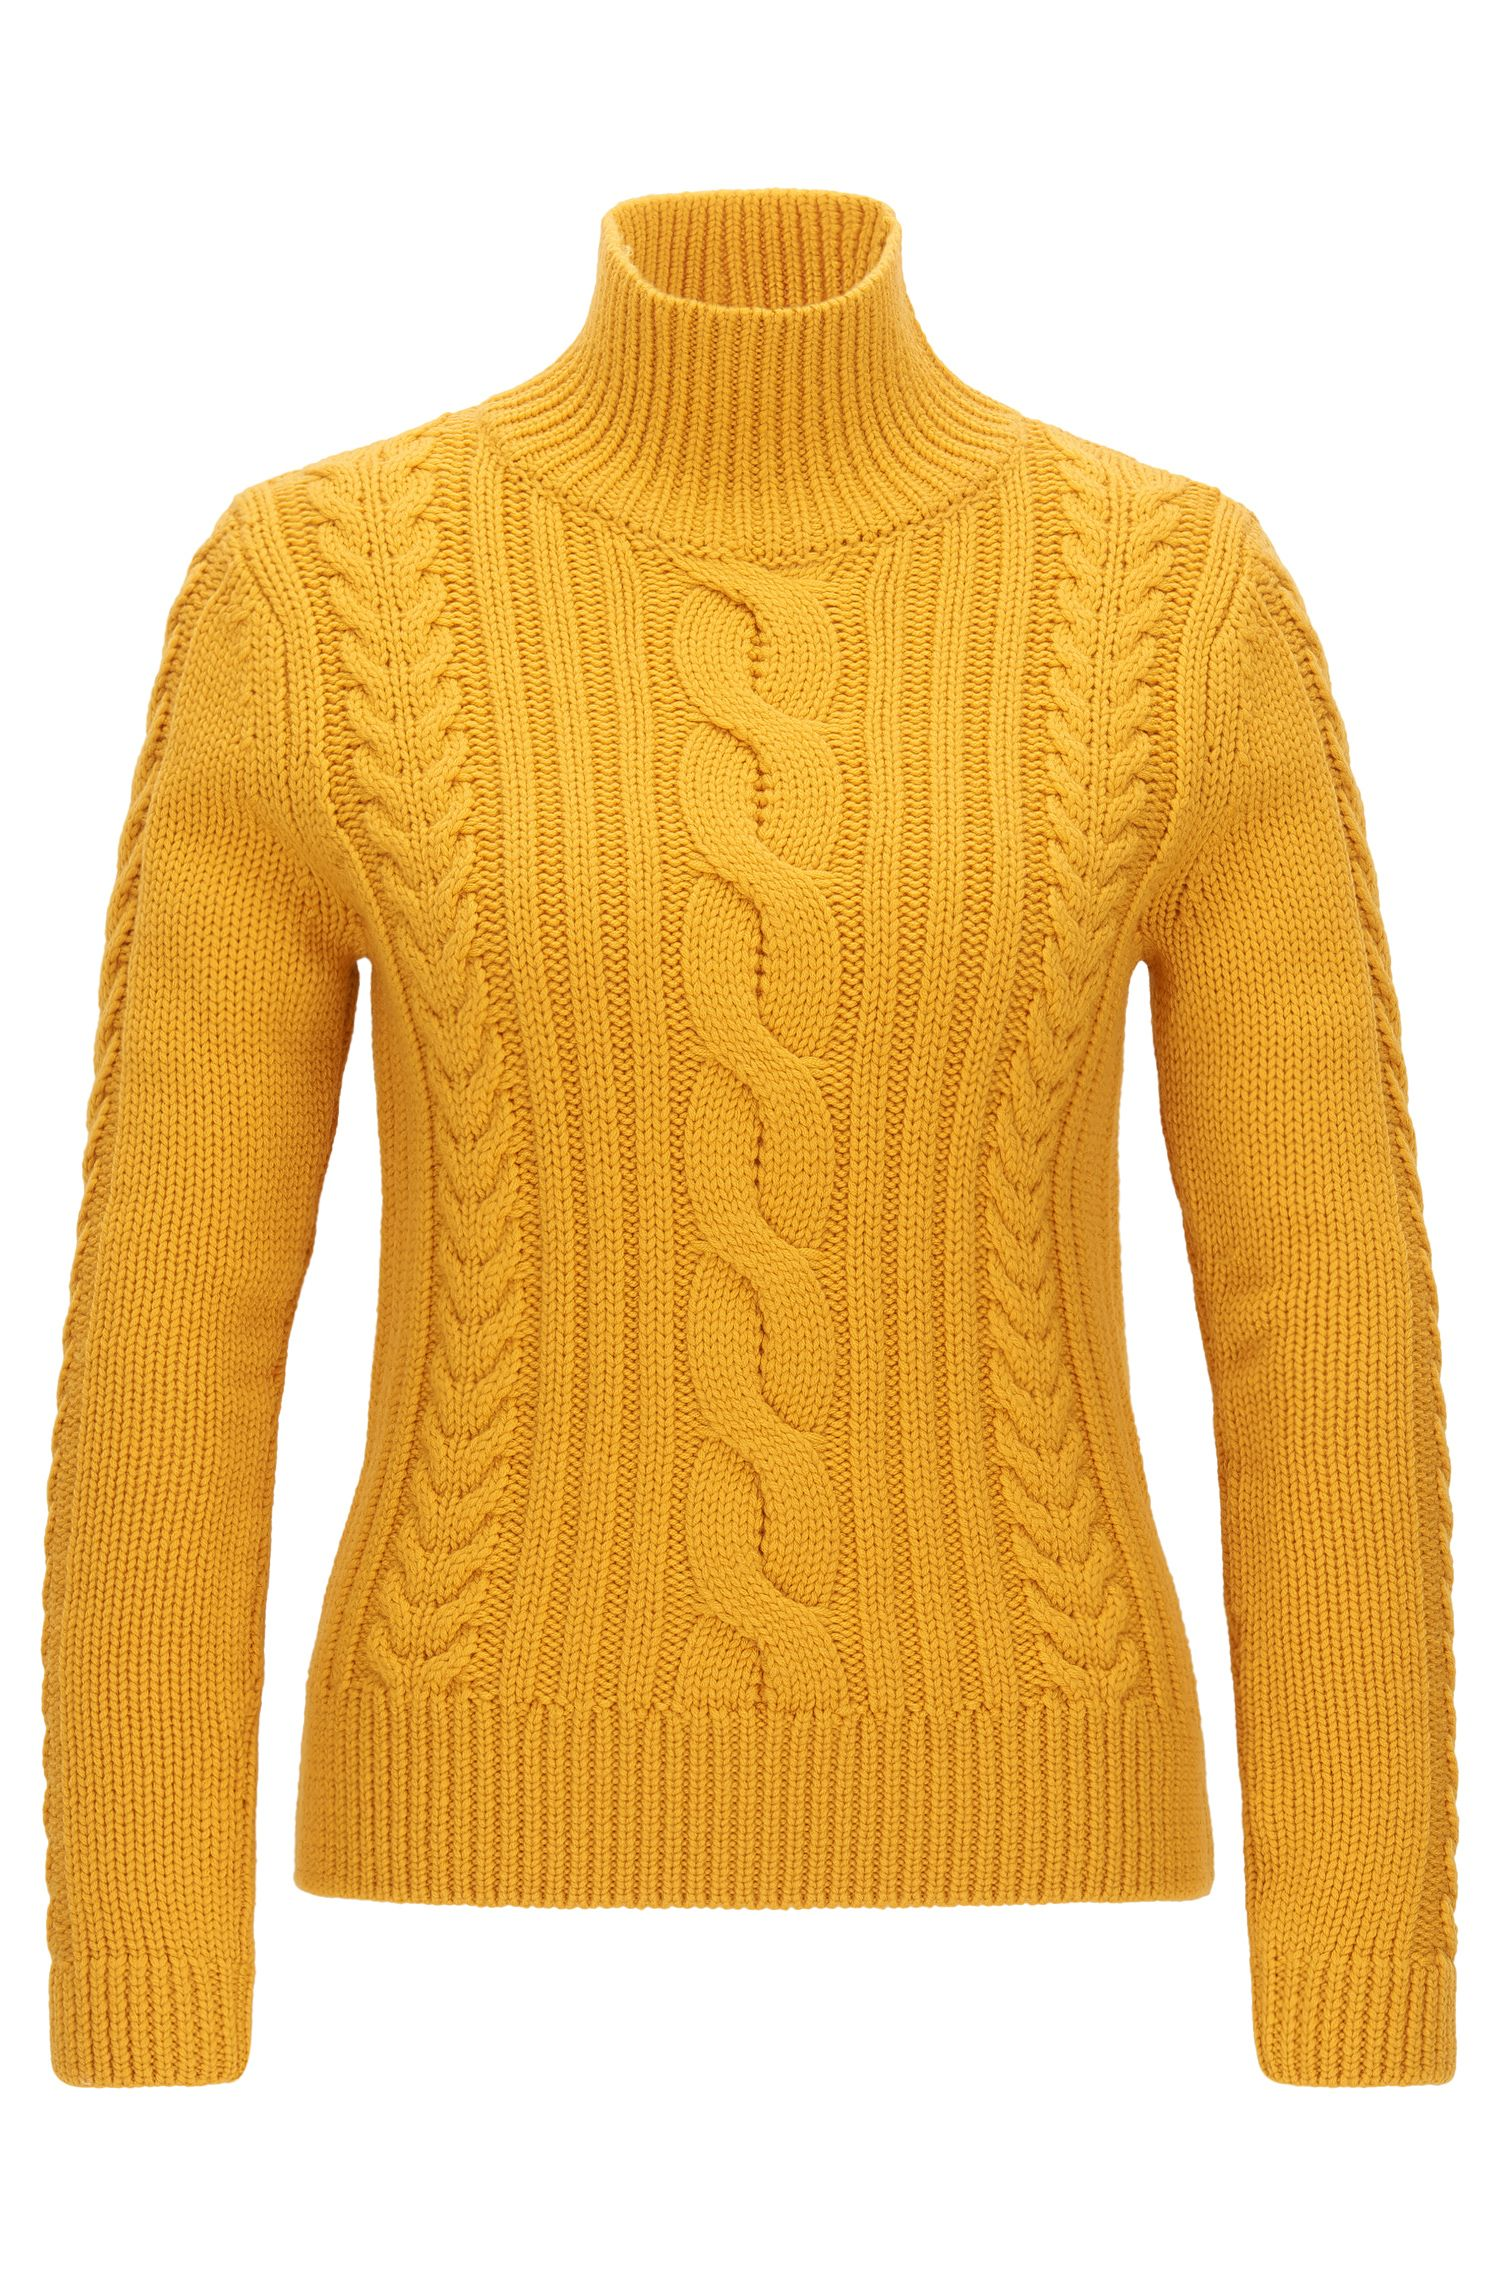 Virgin Wool Cable Knit Sweater | Samini